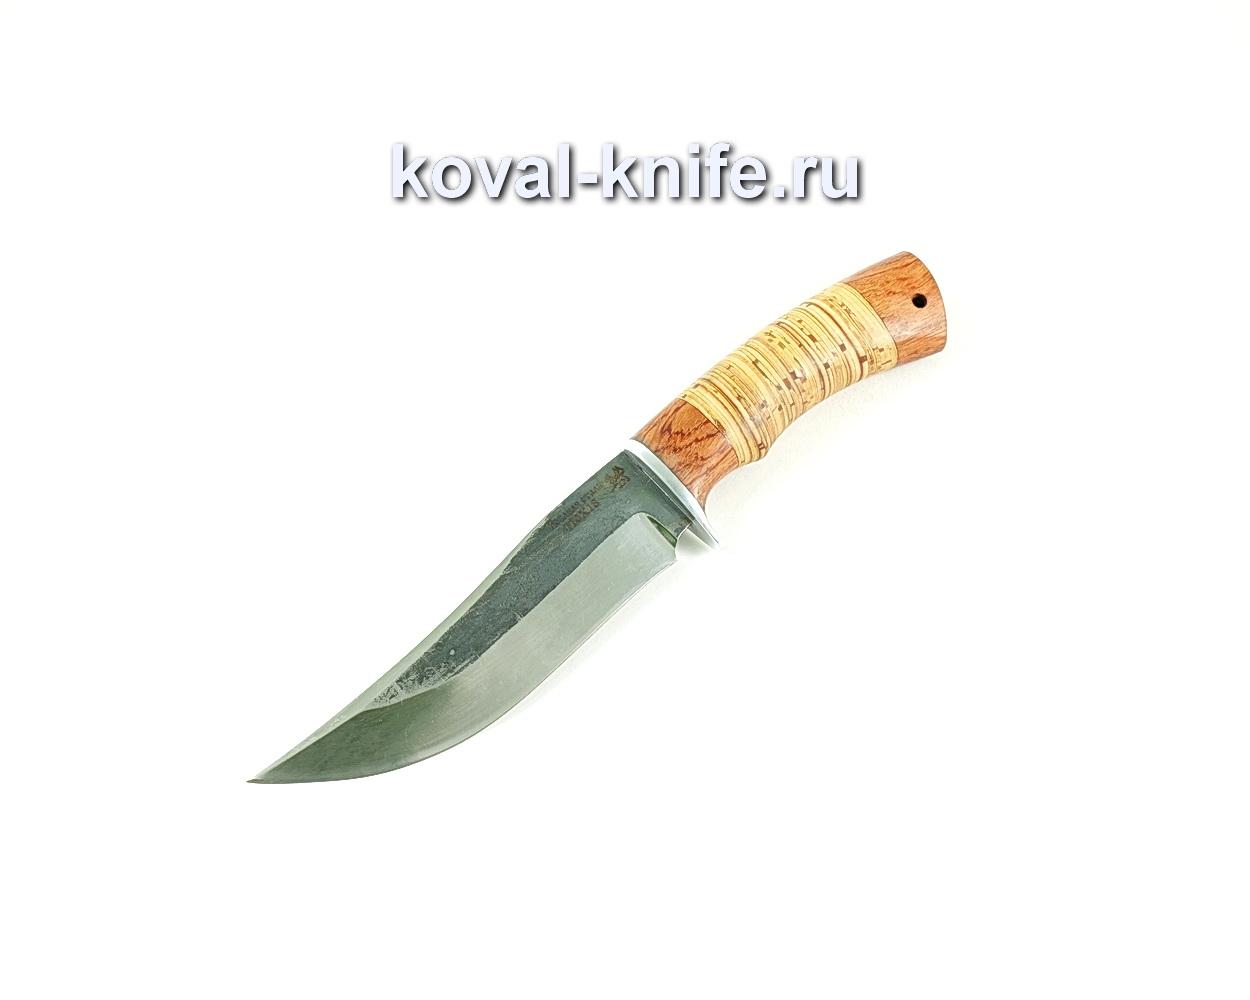 Нож Клыч (сталь 110х18), рукоять бубинга, береста A151